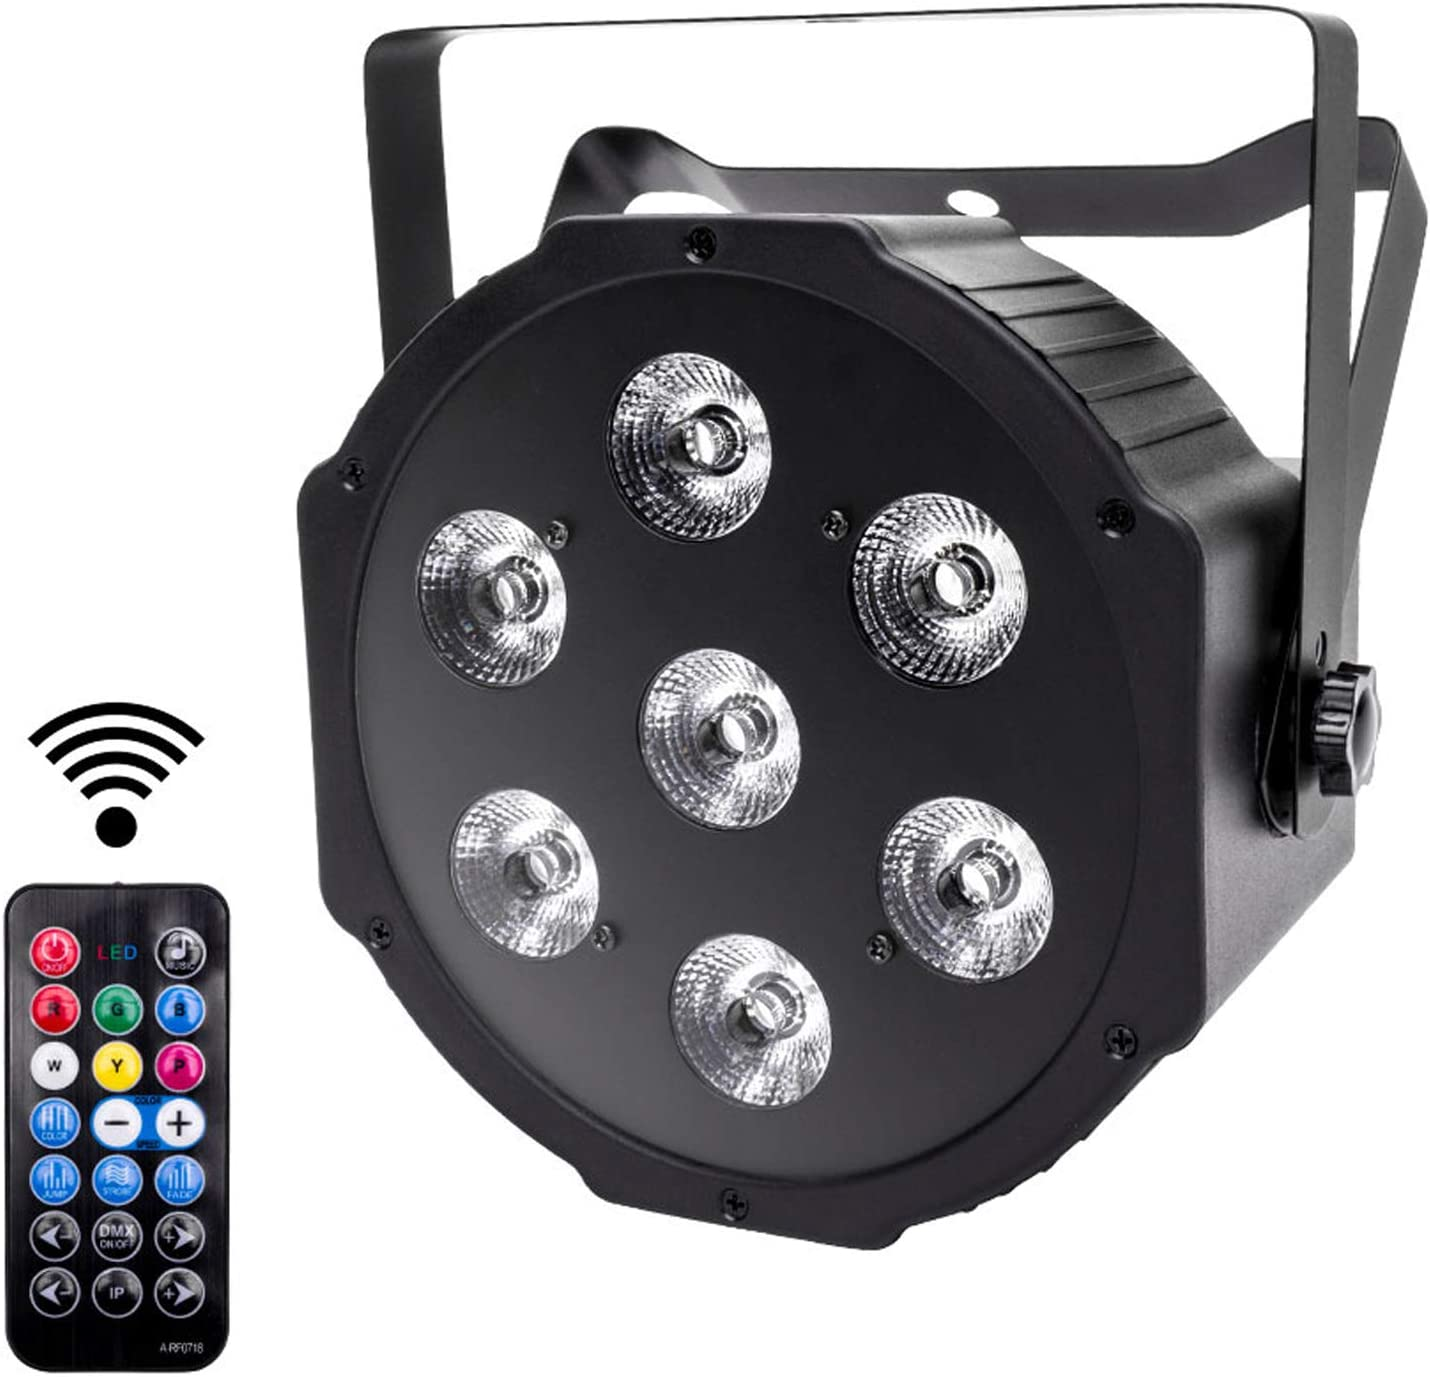 UKing Foco LED Par Luces de Escenrio DMX 7leds RGBW luminación con Control Remoto Sonido Activado 8 Modos Luz de Discoteca para DJ Bar Boda Navidad